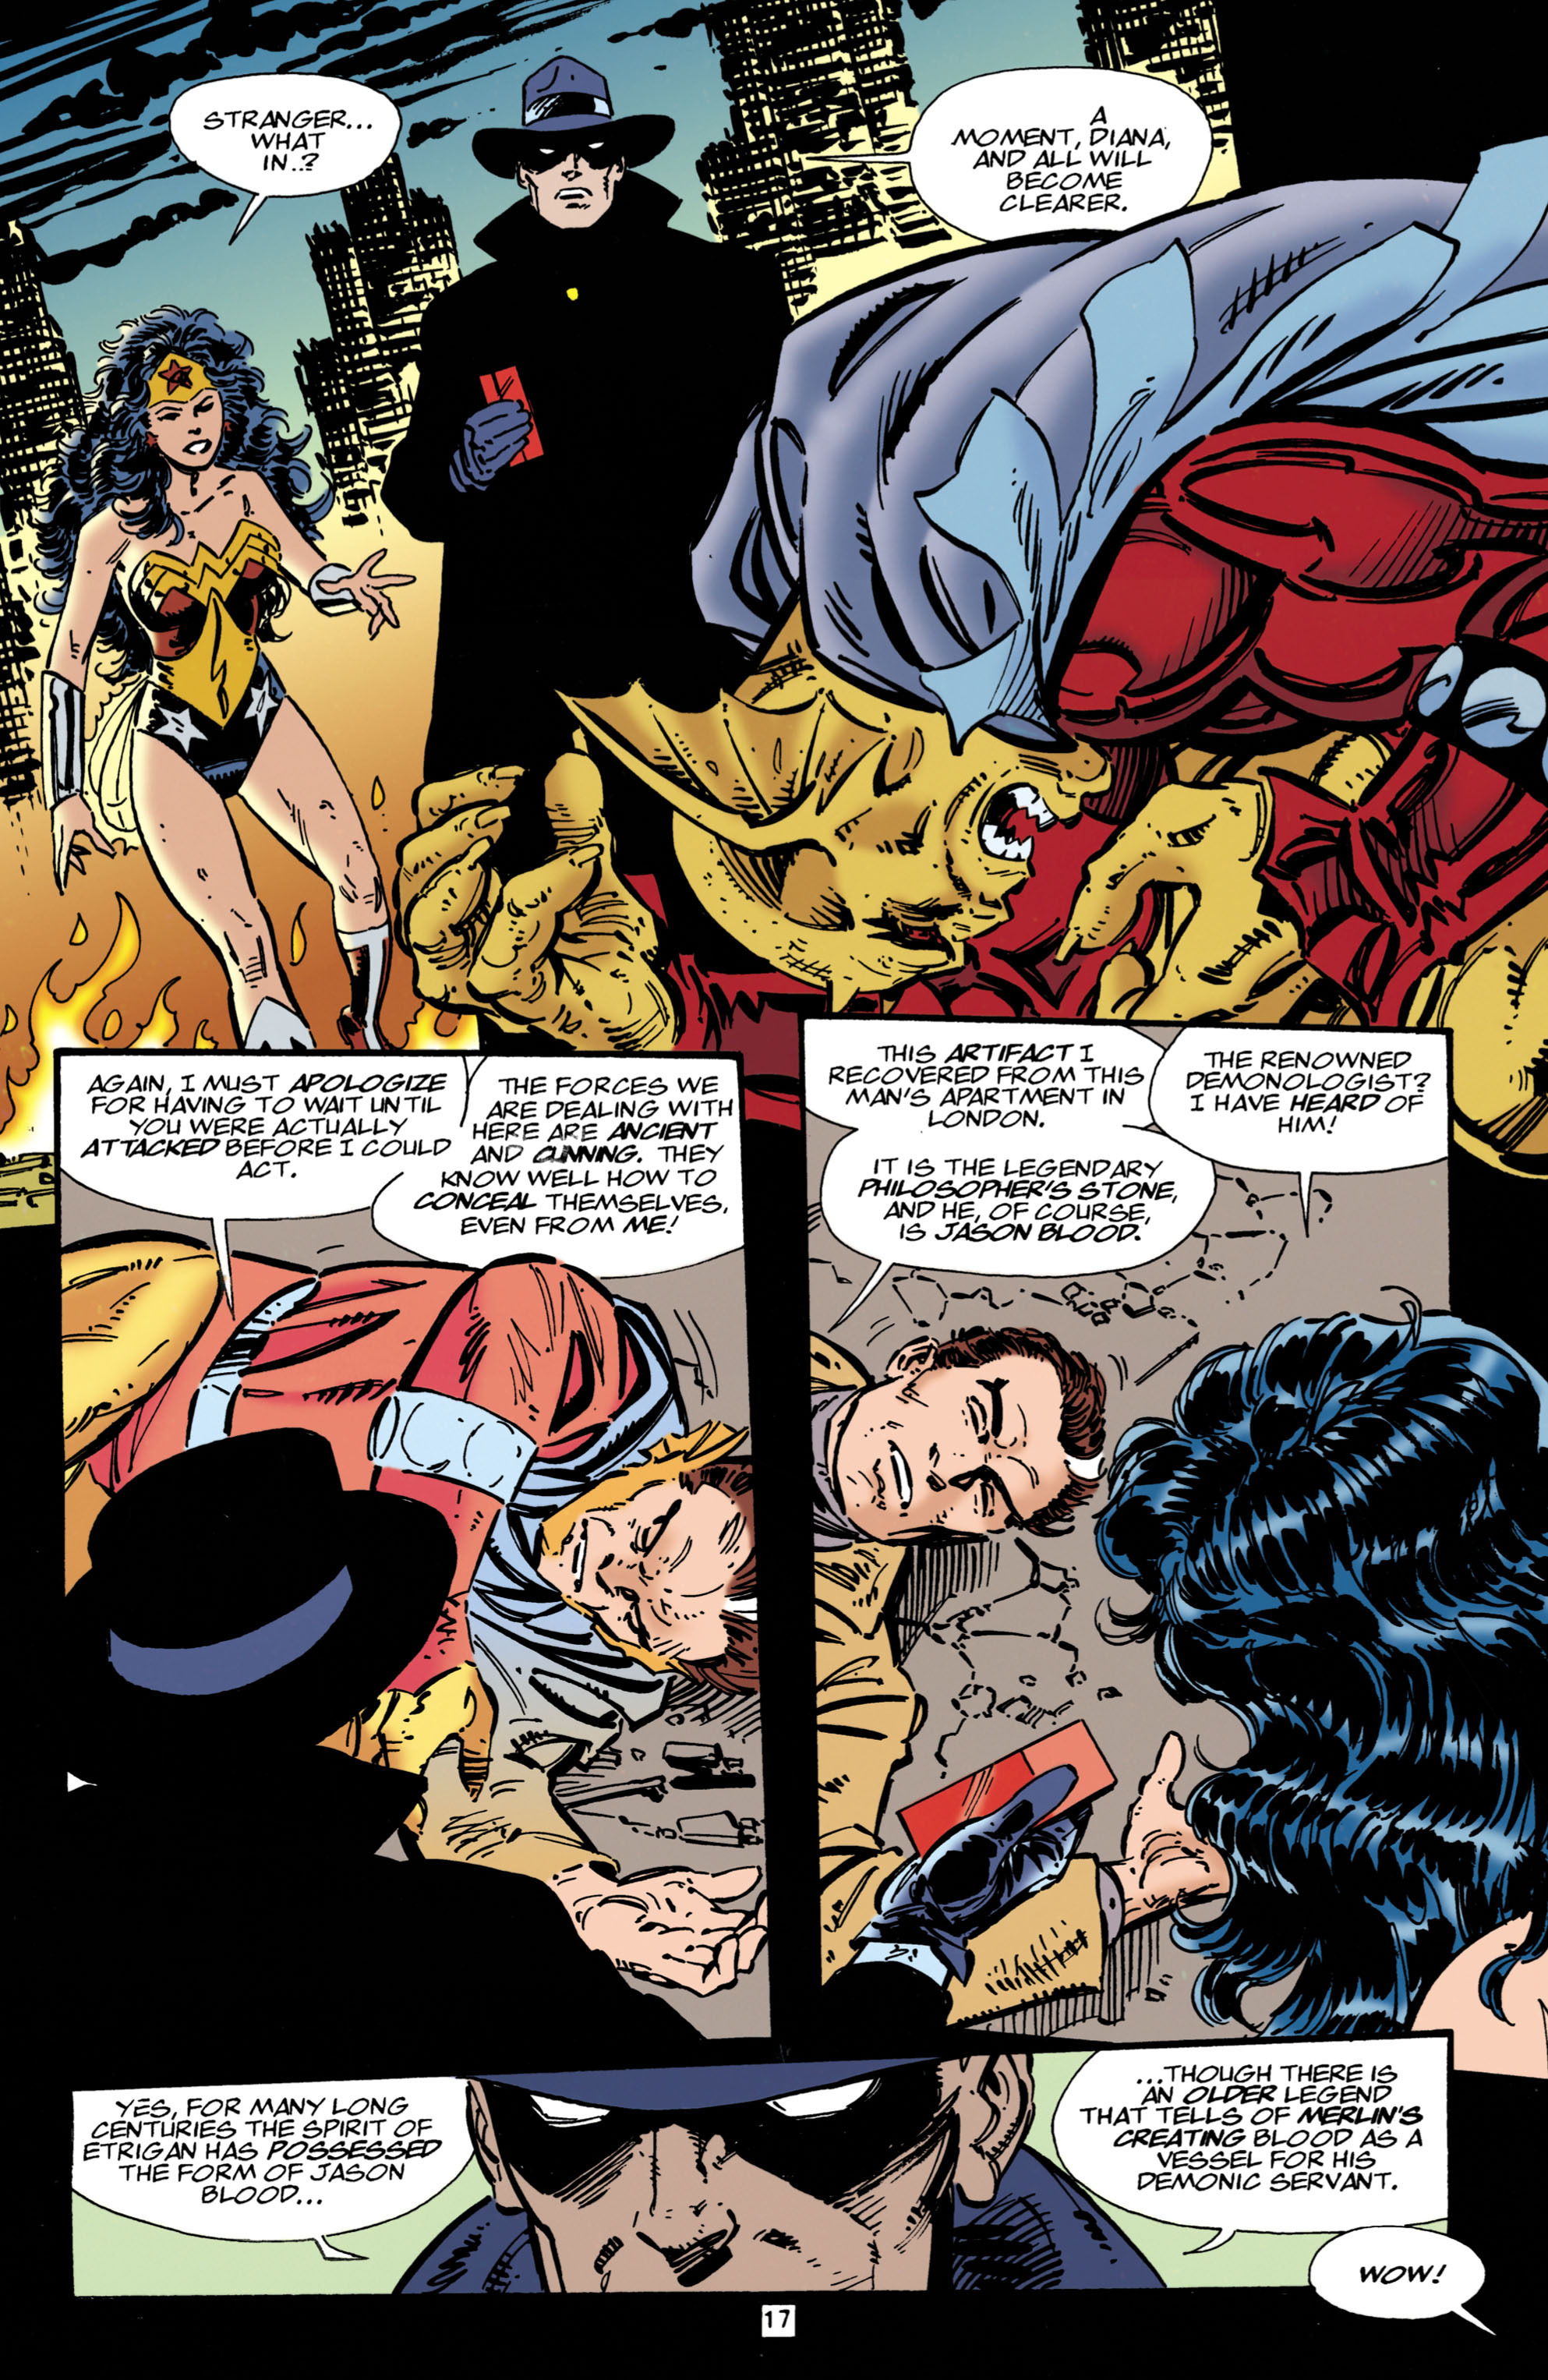 Read online Wonder Woman (1987) comic -  Issue #107 - 17